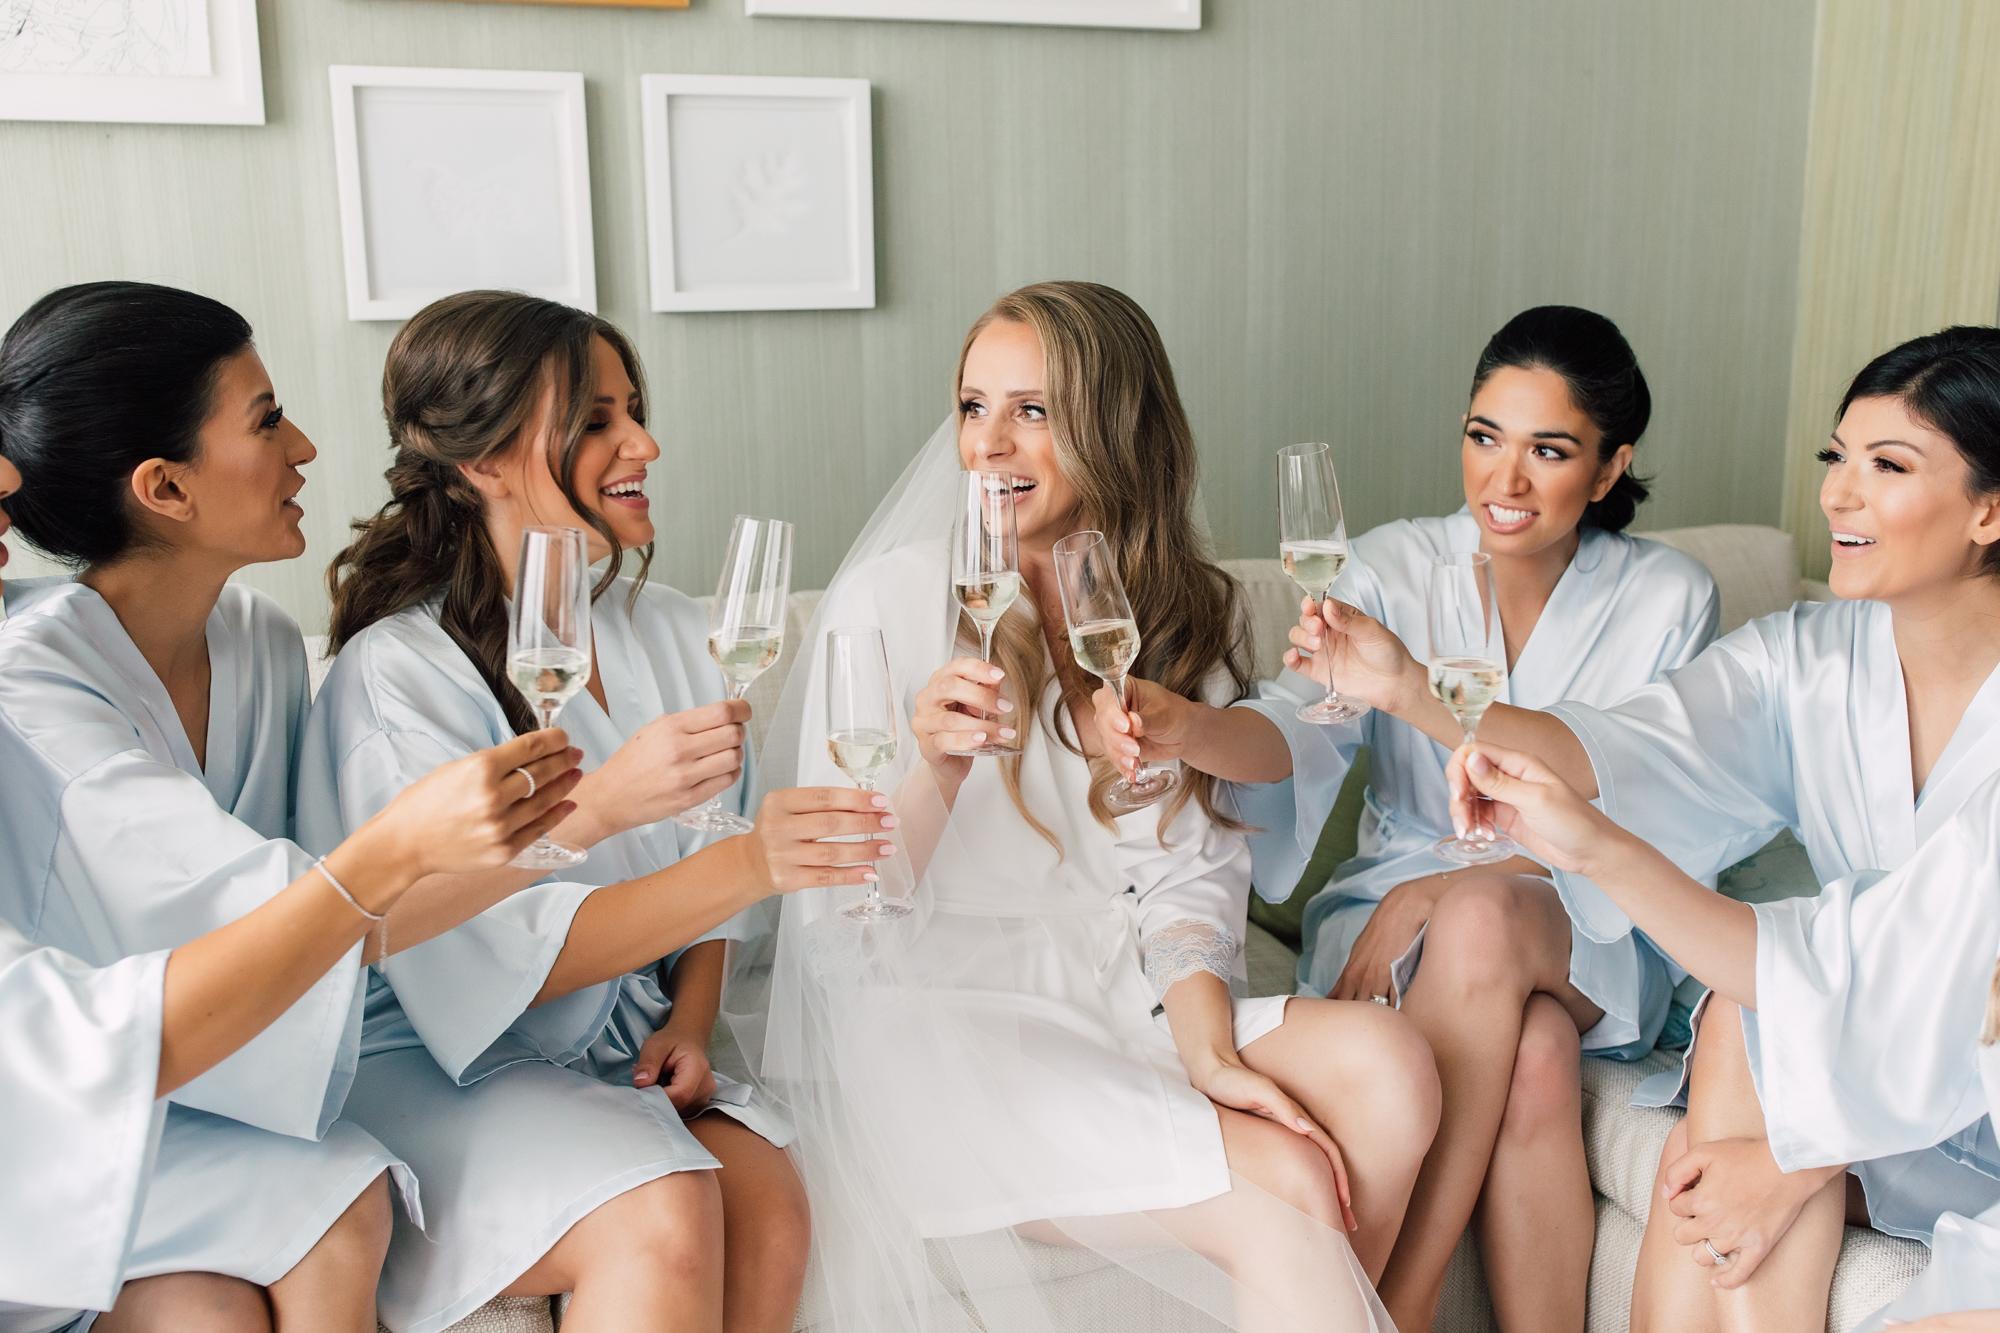 bridal bridesmaids champagne